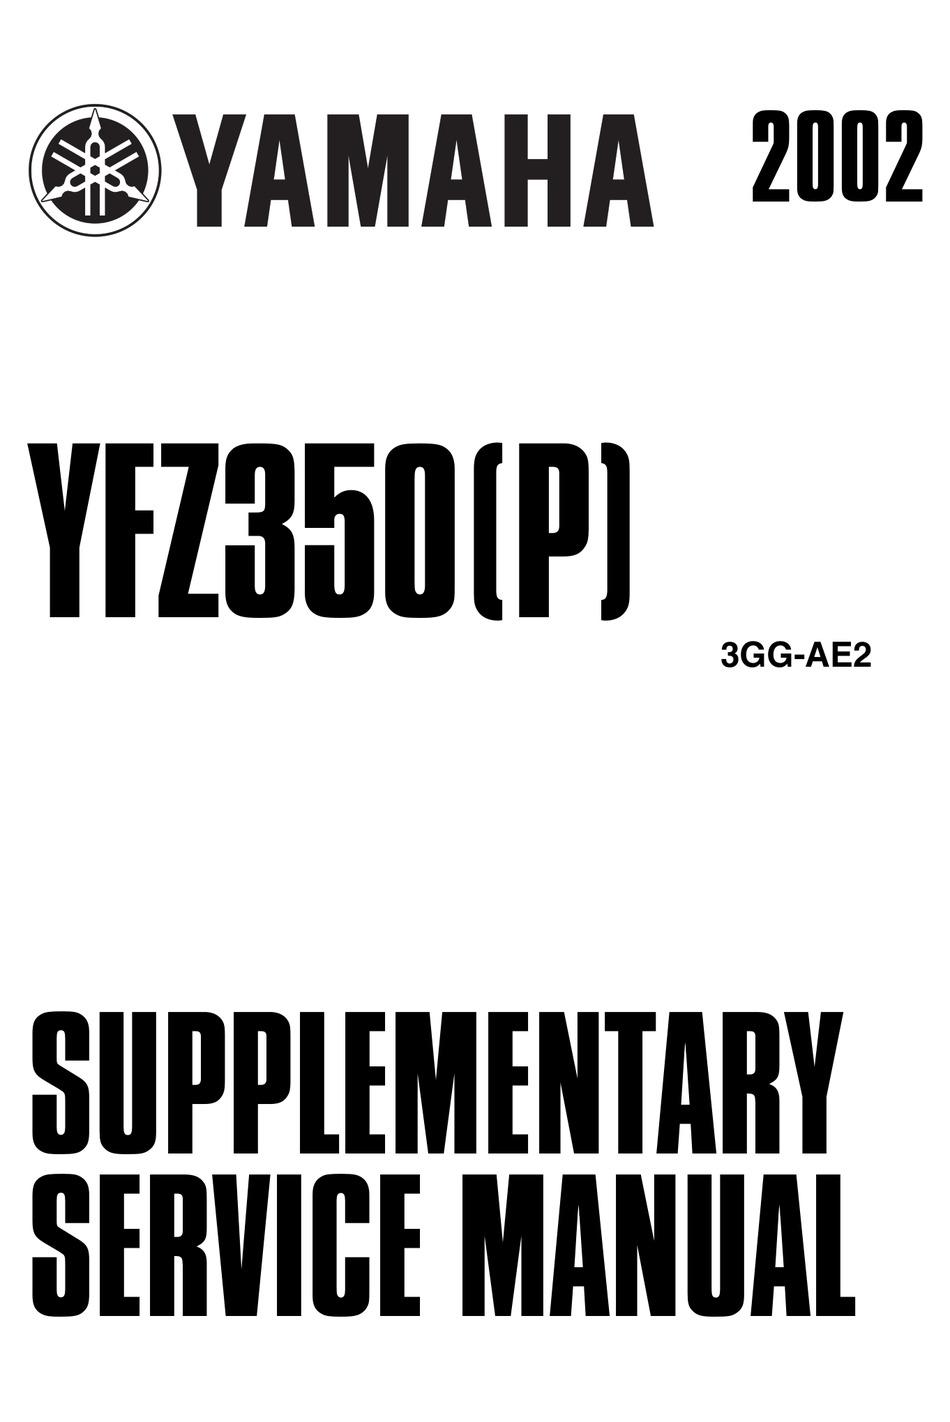 YAMAHA YFZ350(P) 2002 SUPPLEMENTARY SERVICE MANUAL Pdf